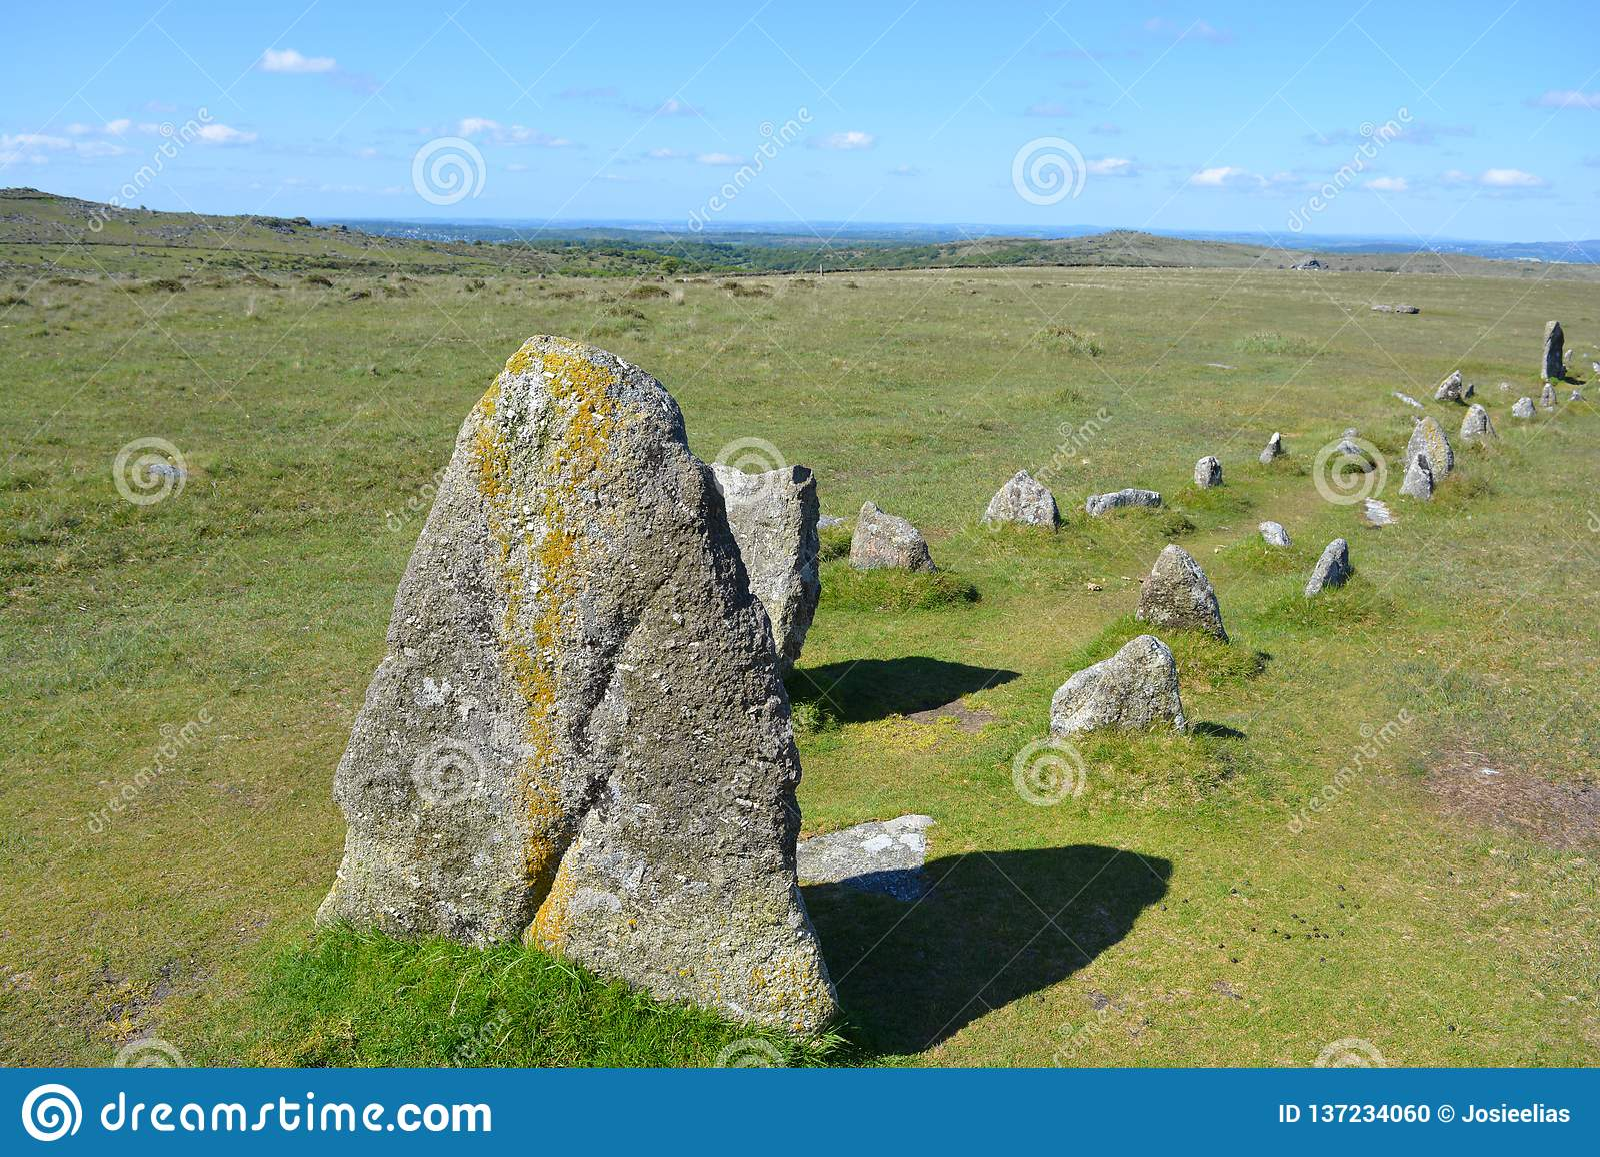 Prehistoric stone row,Dartmoor National Park, Devon, UK